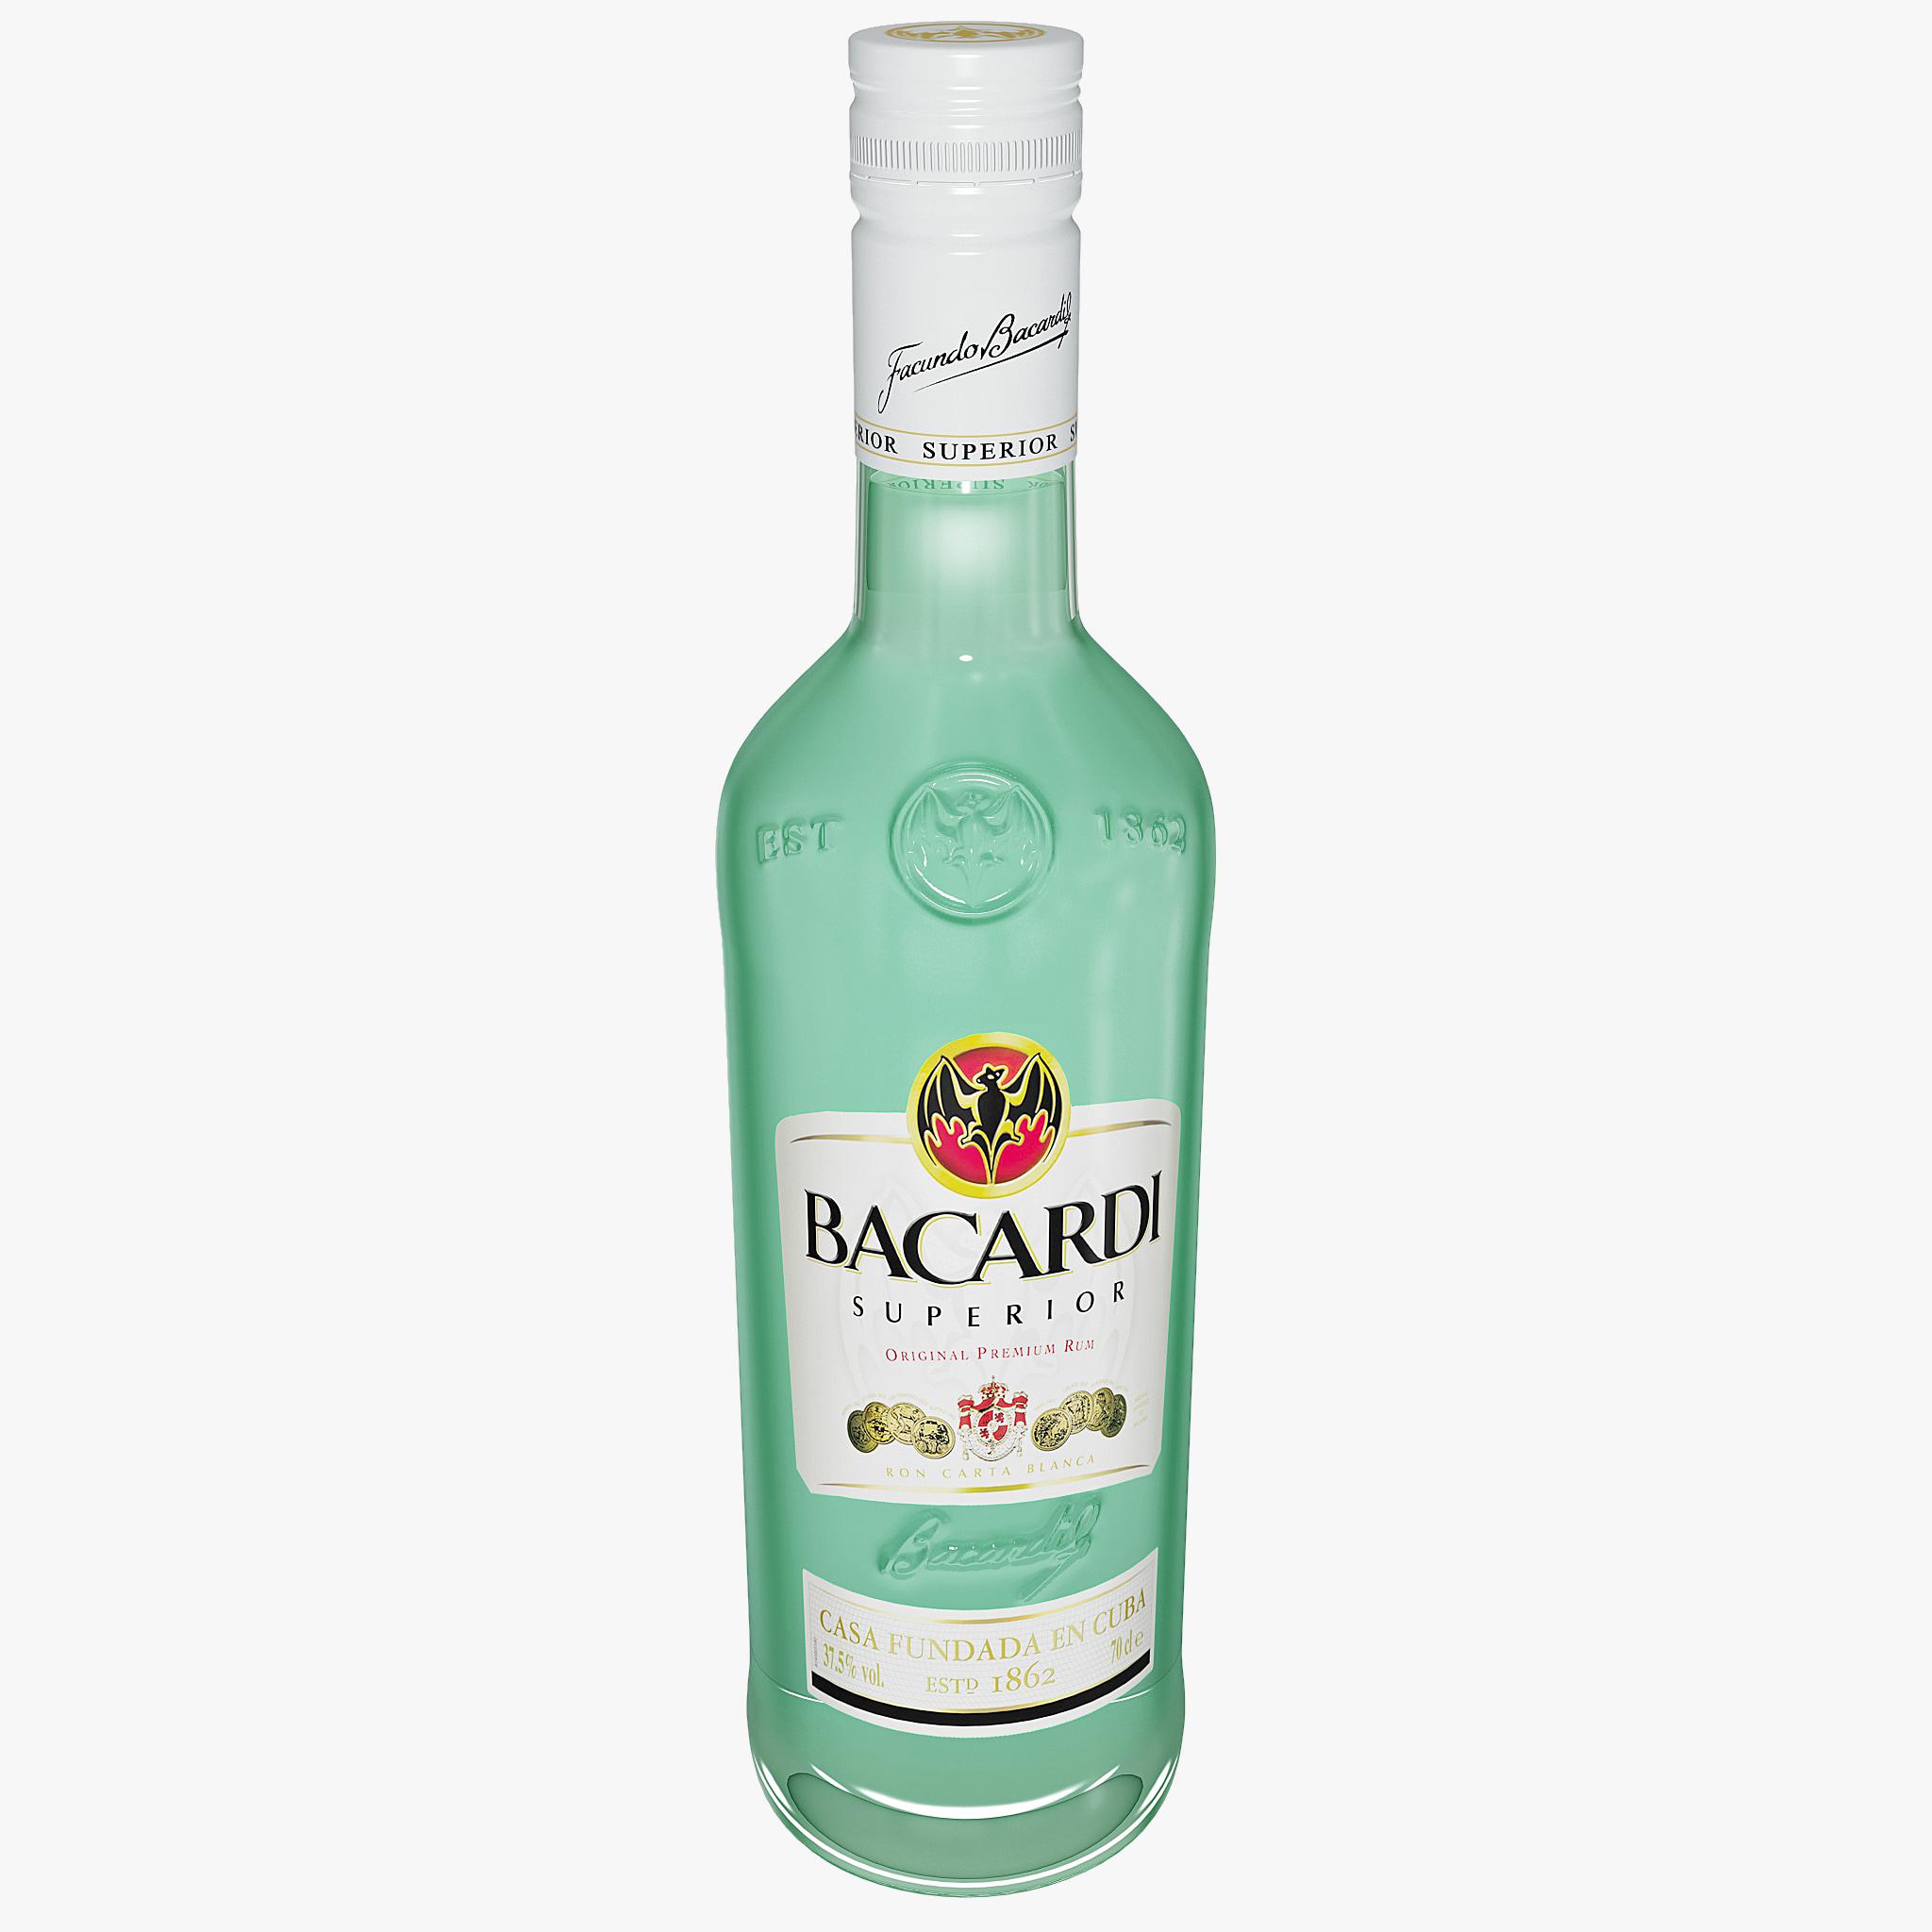 253319_Bacardi_Bottle_of_Rum_000.jpg